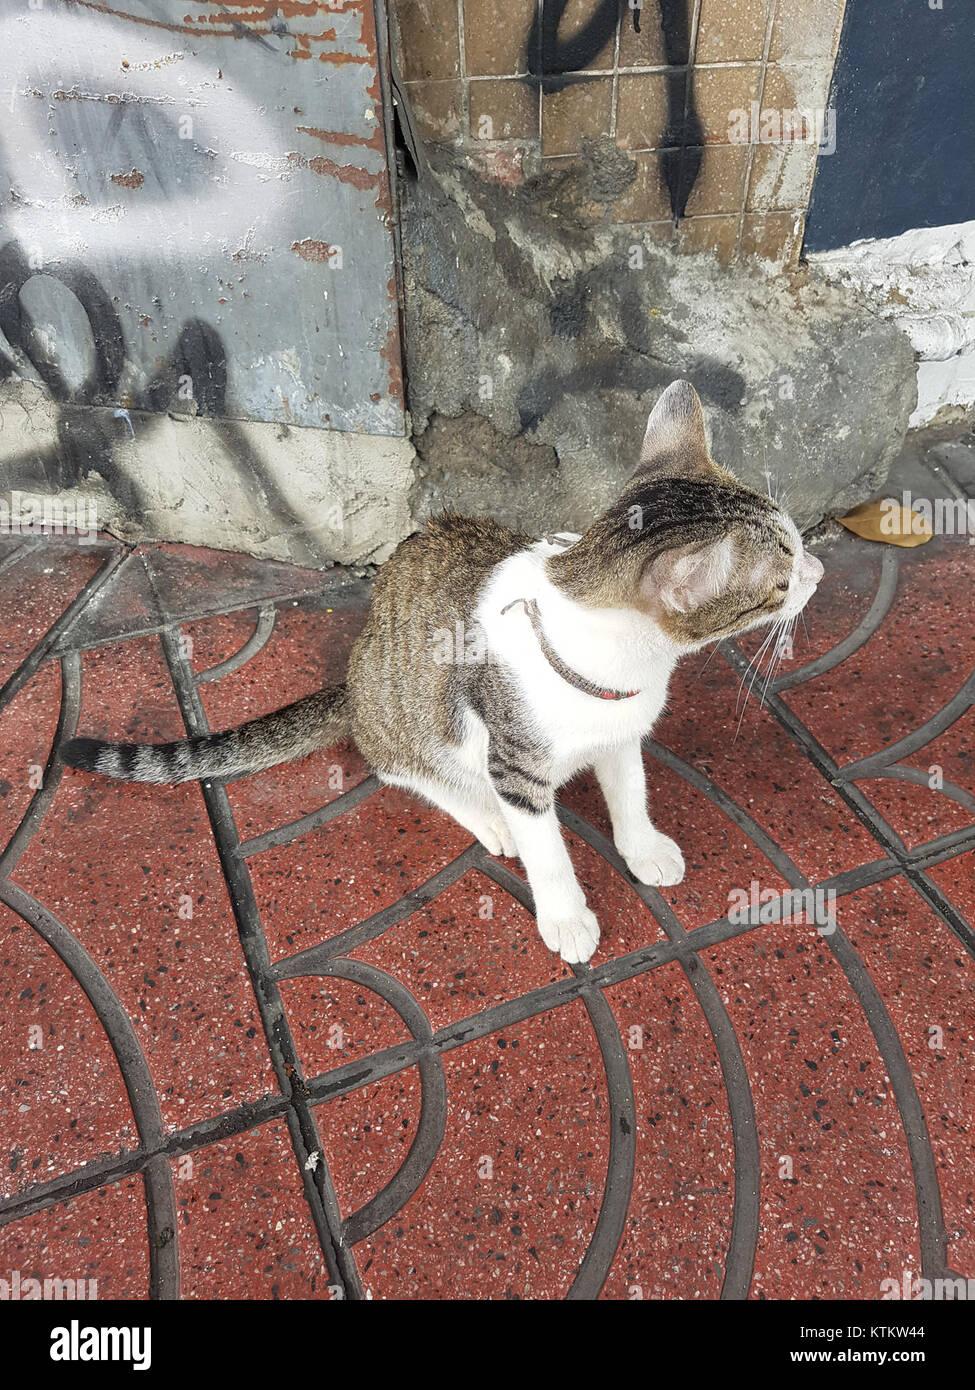 Bangkok kitty   2017 05 12 (001) - Stock Image